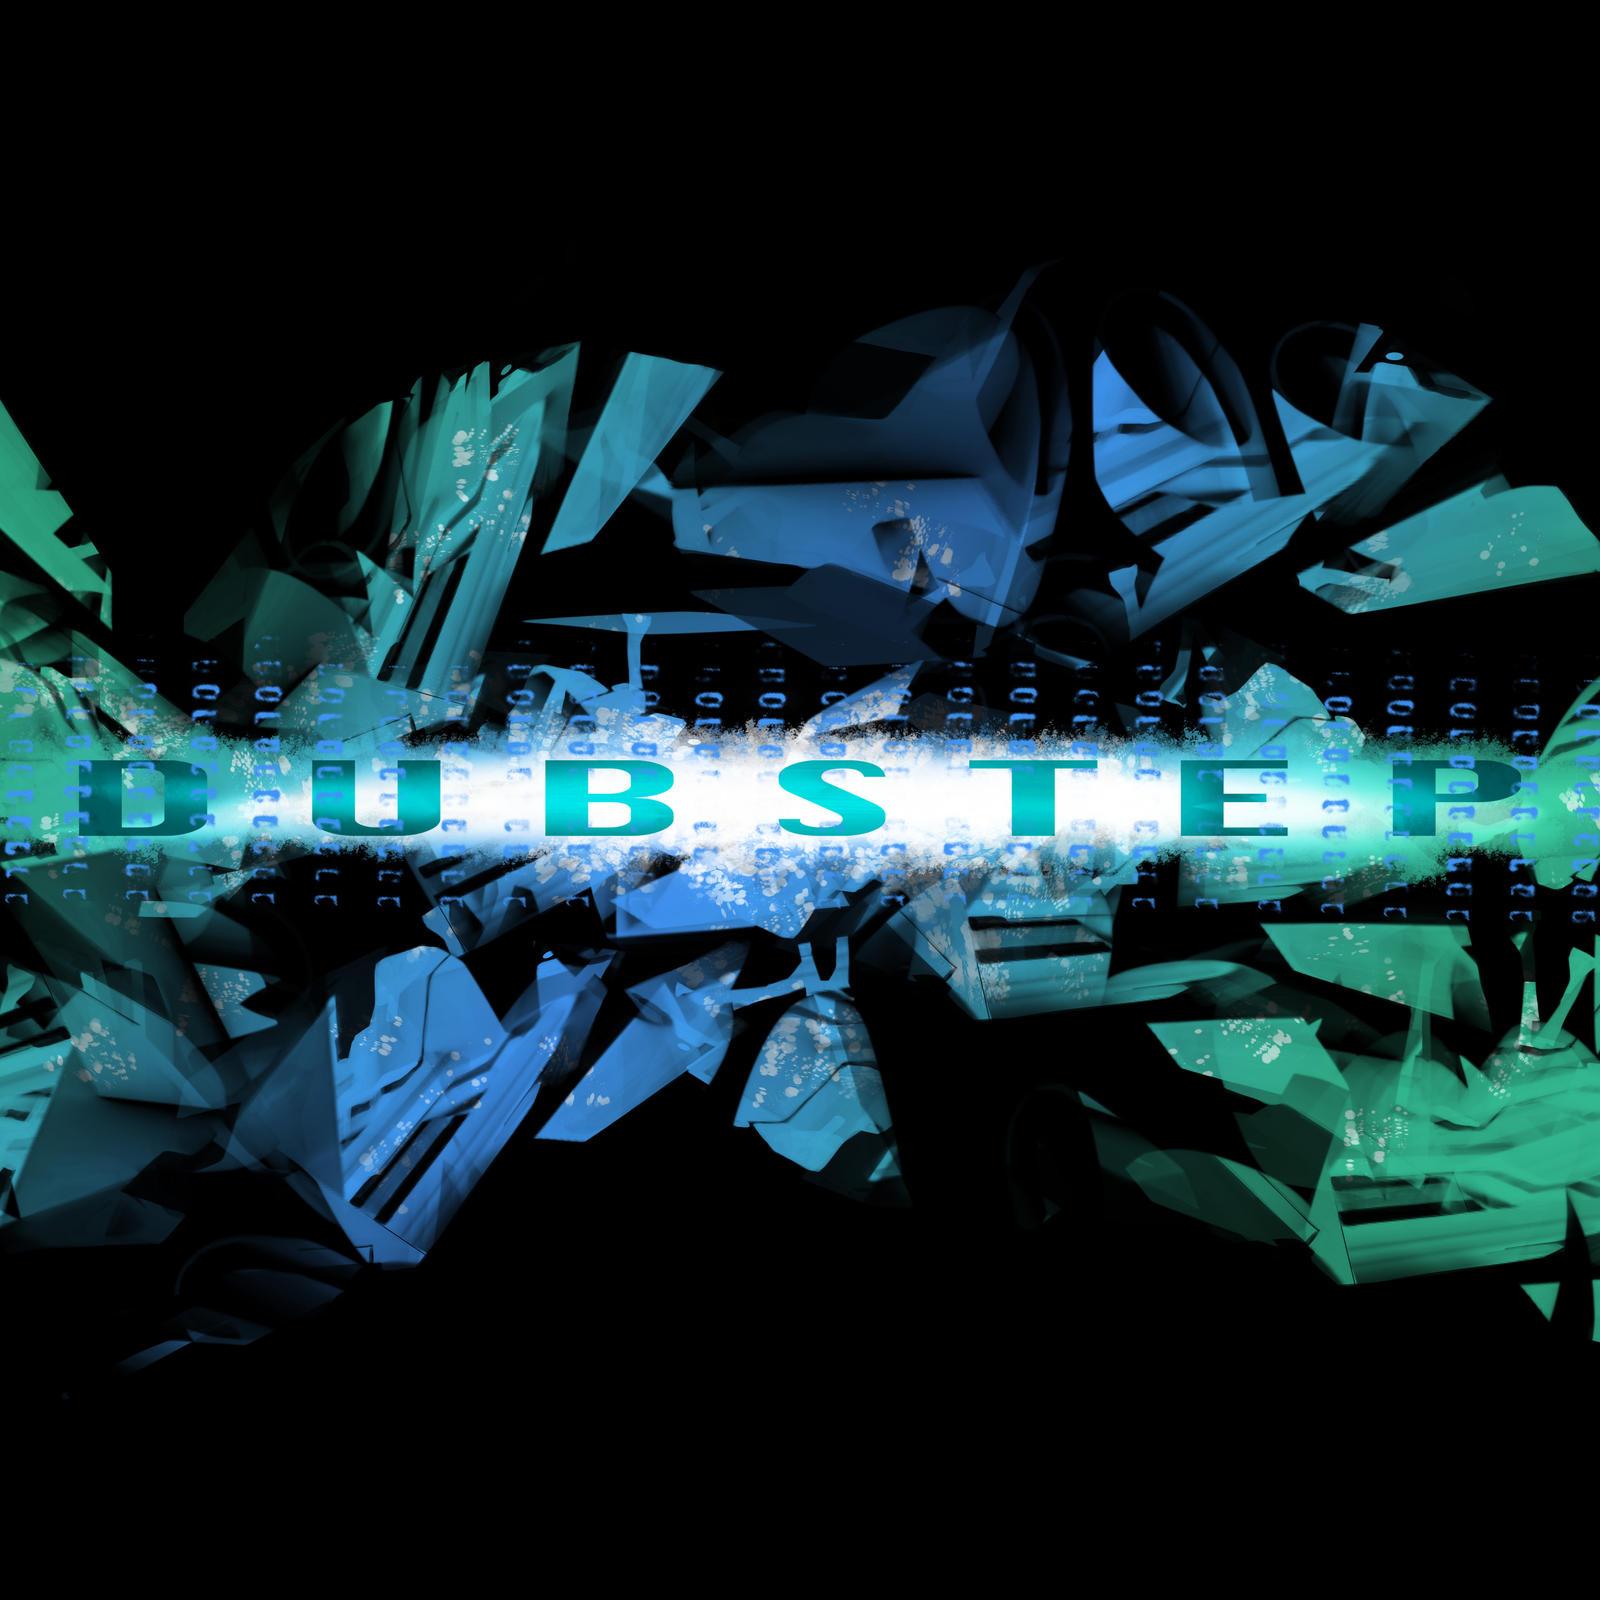 Dubstep cd covers 1 by JoshuaDunlop on DeviantArt